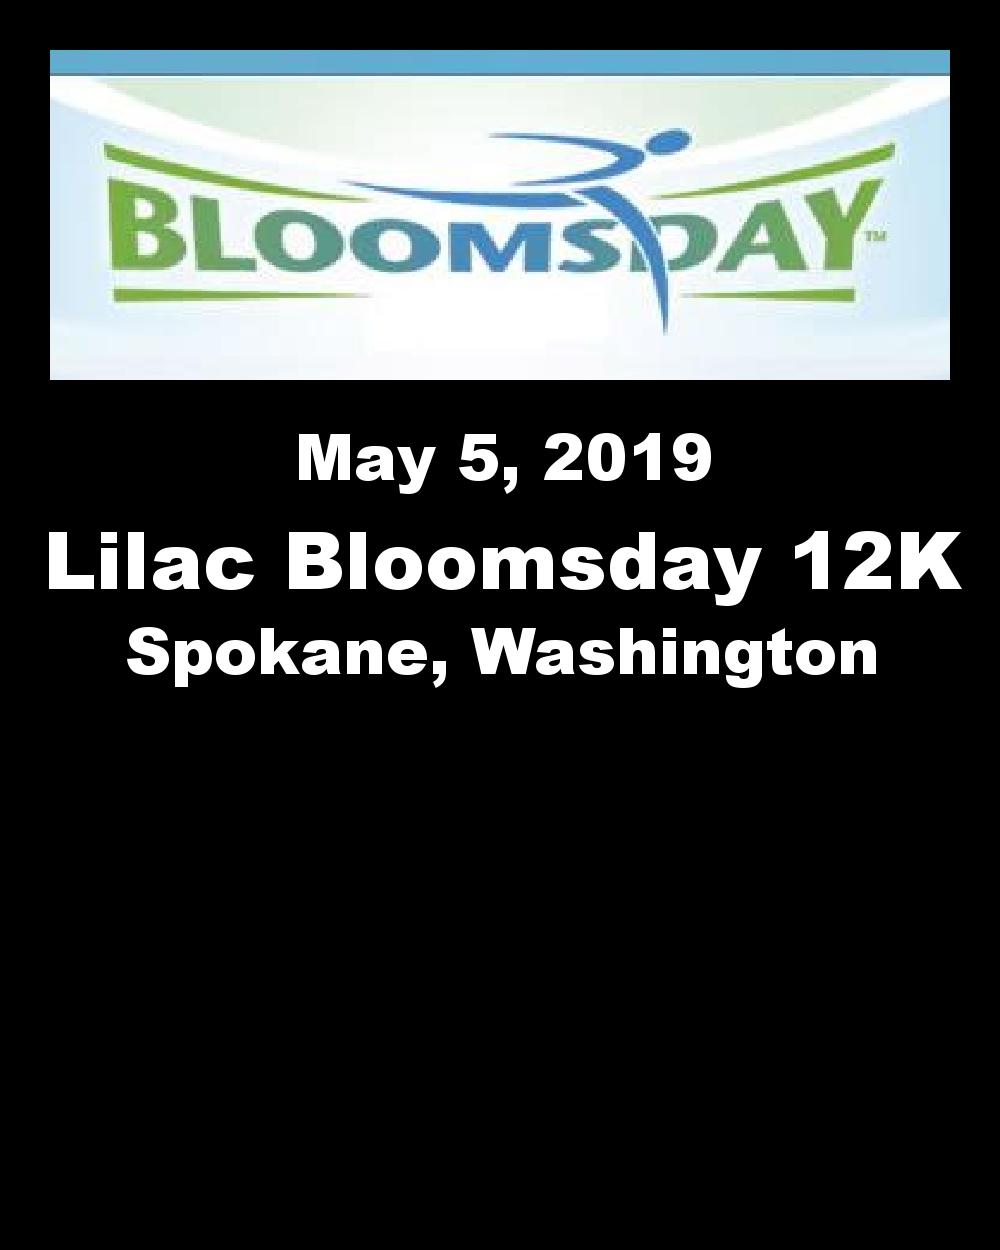 Lilac Bloomsday 12k Spokane Washington 552019 My Best Runs